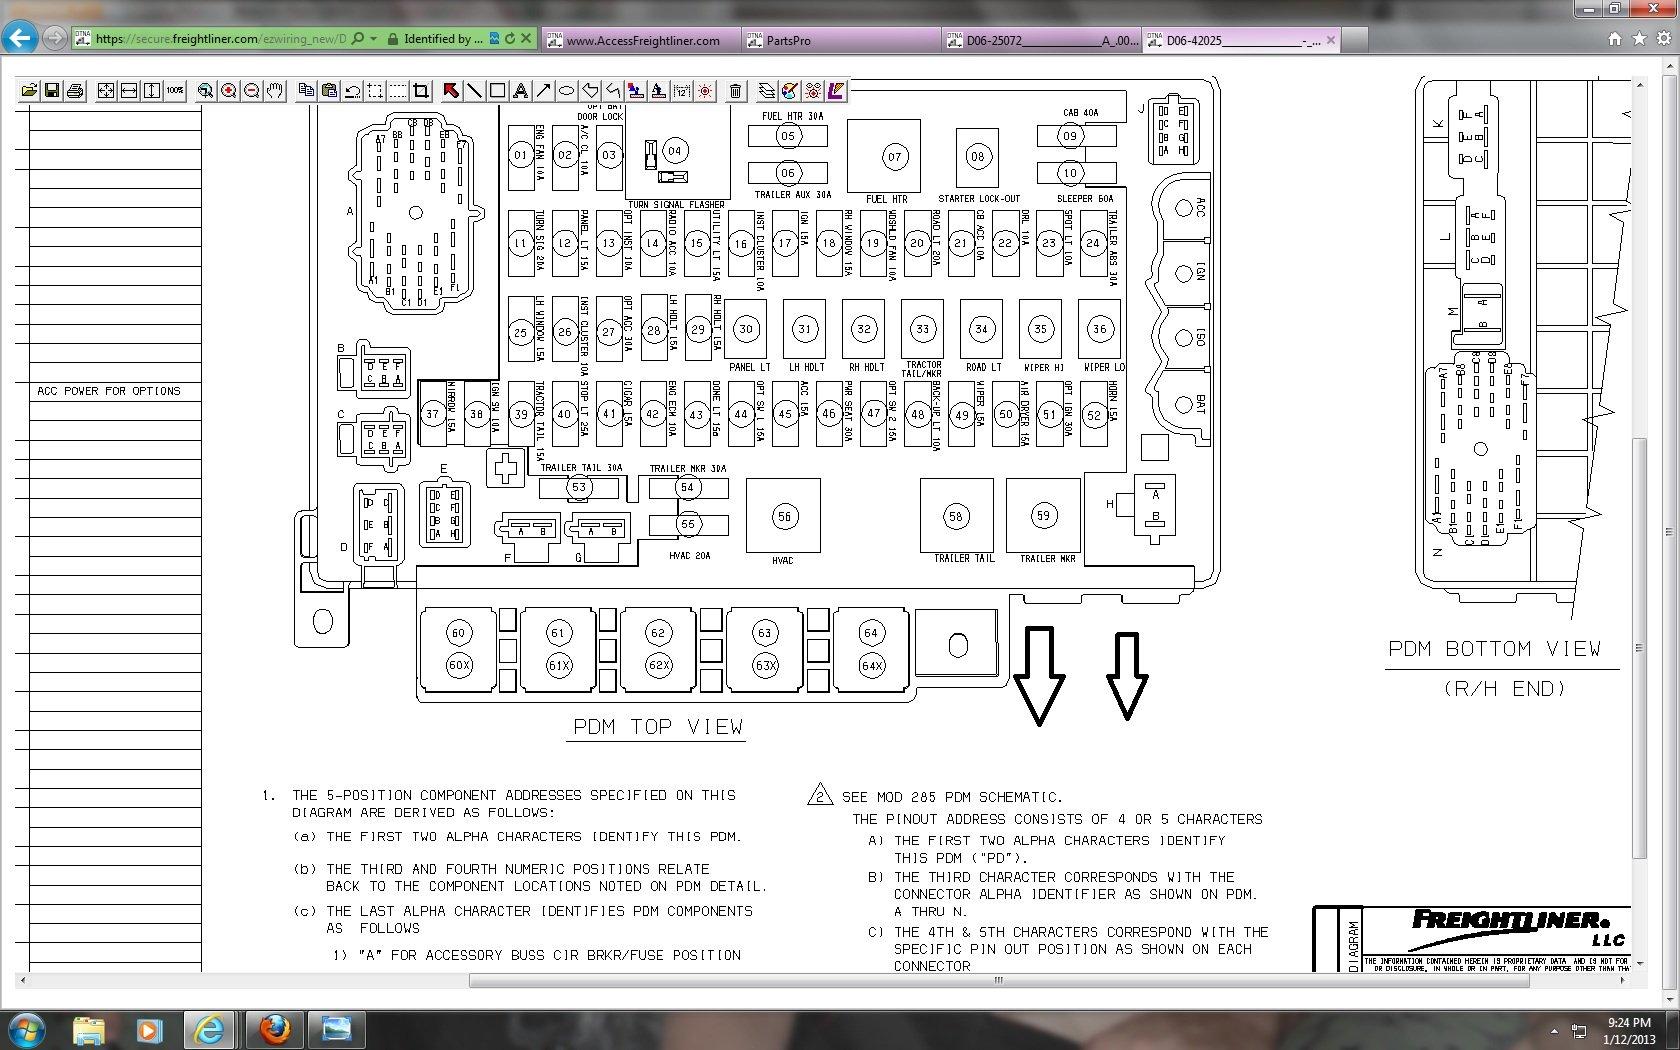 1996 mack fuse box hk 1427  fl112 wiring diagram free diagram  hk 1427  fl112 wiring diagram free diagram